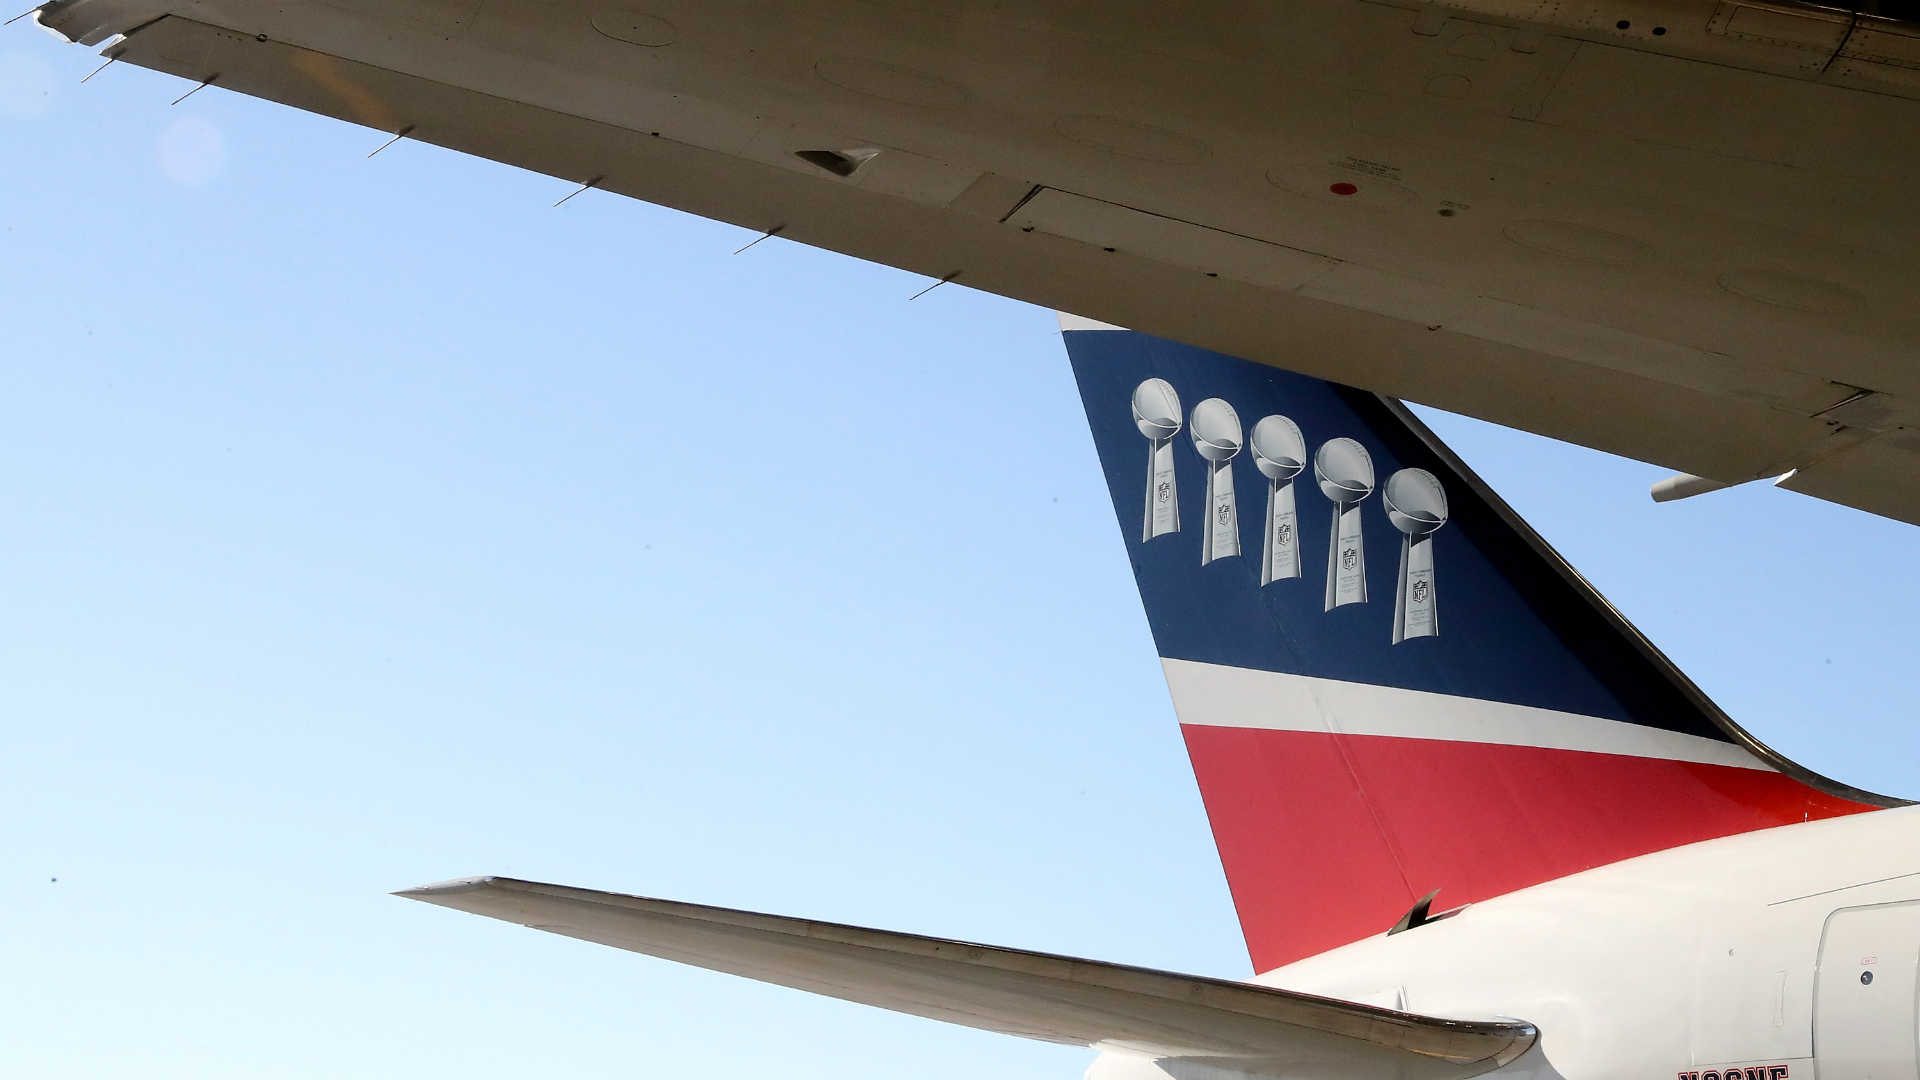 Patriots-team-airplane_18tvbc3s5fhsa1v44n1owgj3n1